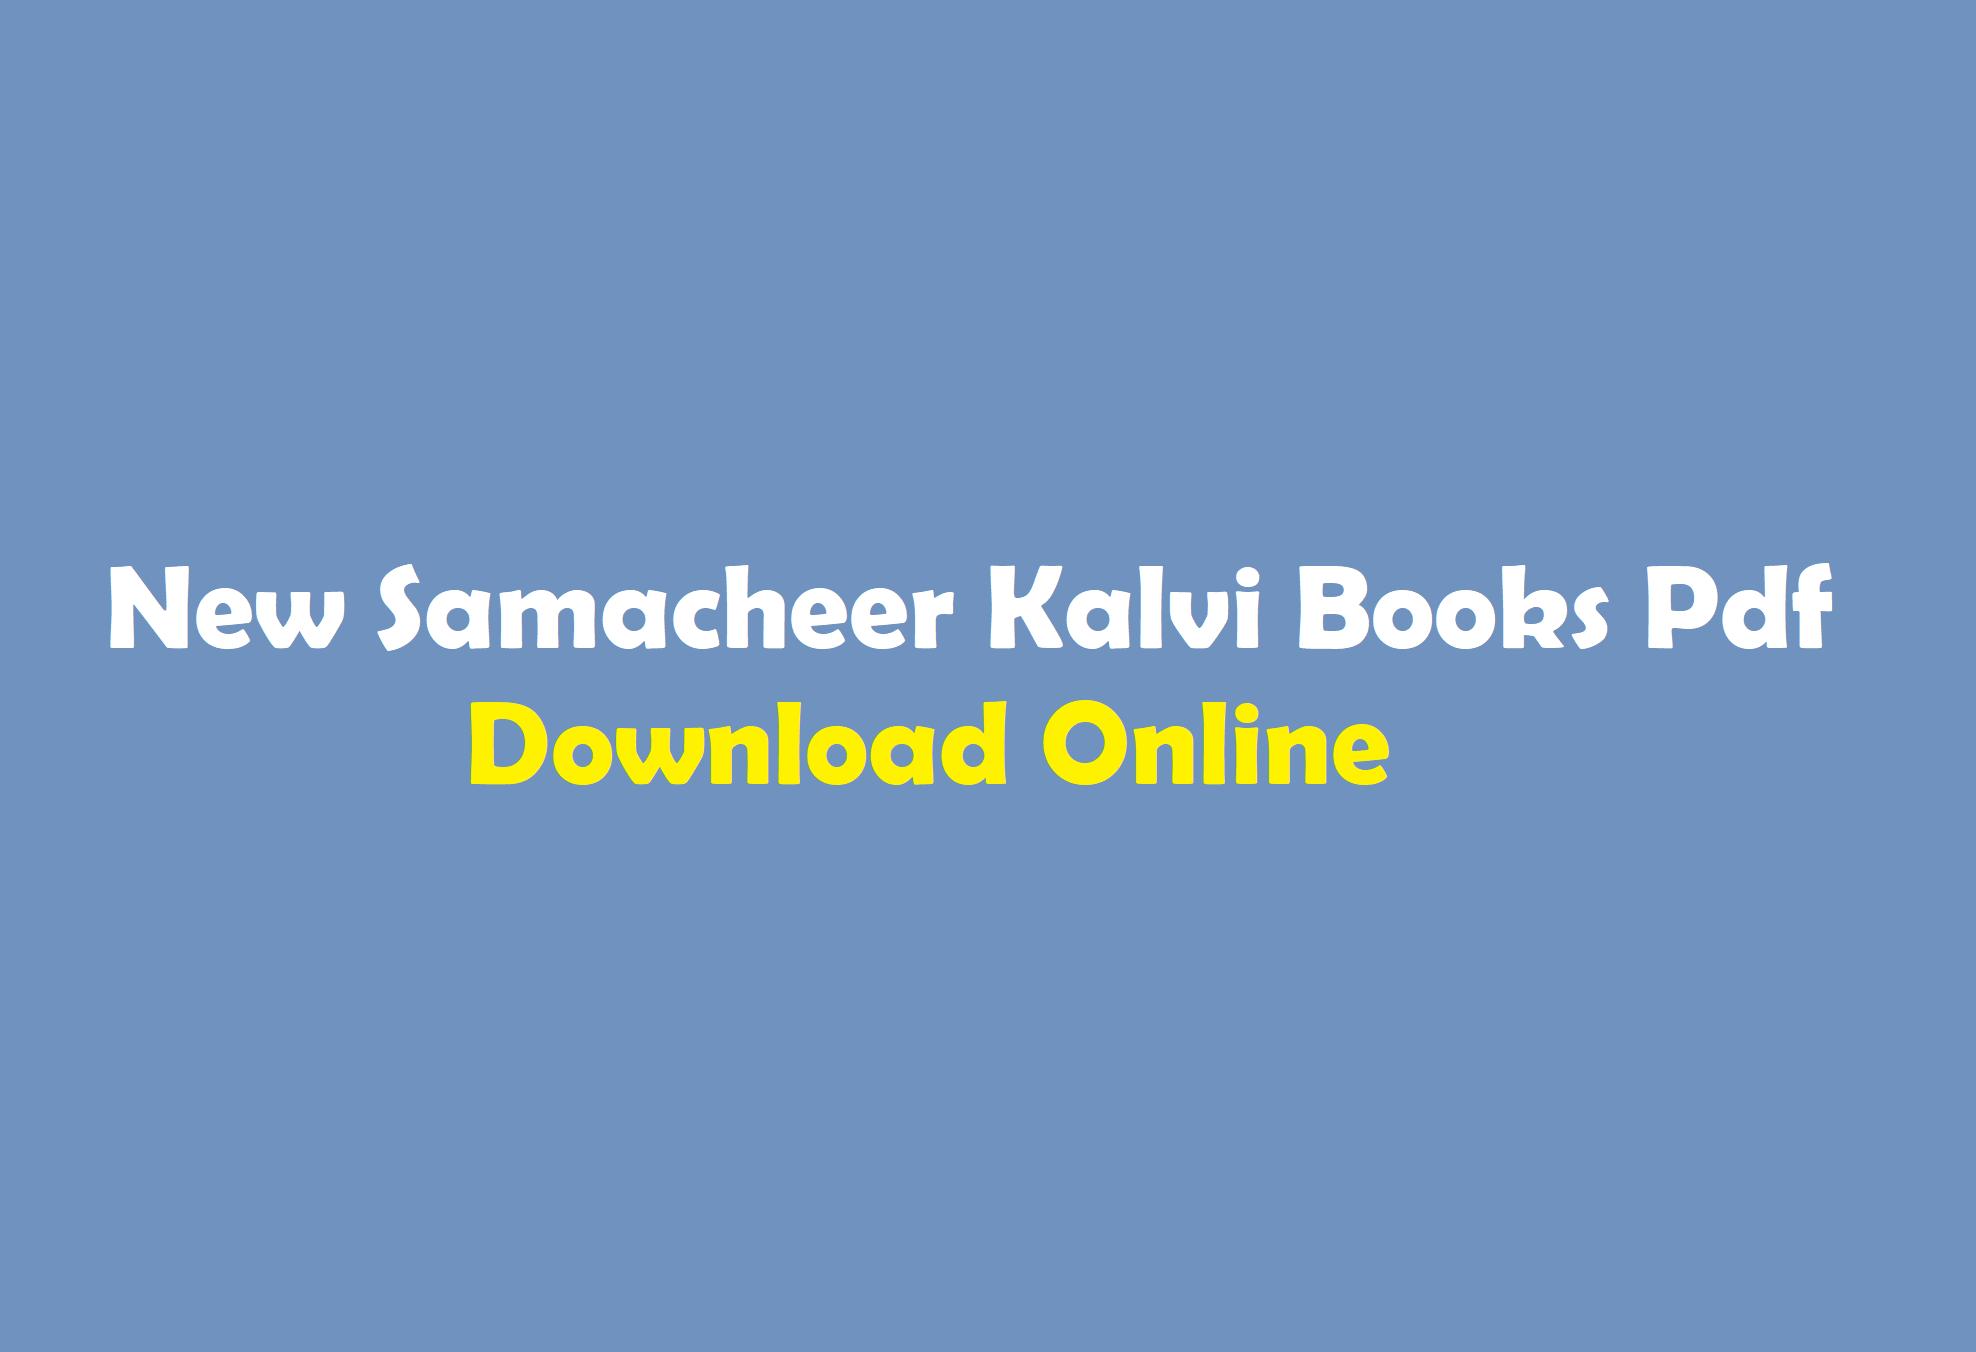 Tamilnadu State Board School Books Pdf